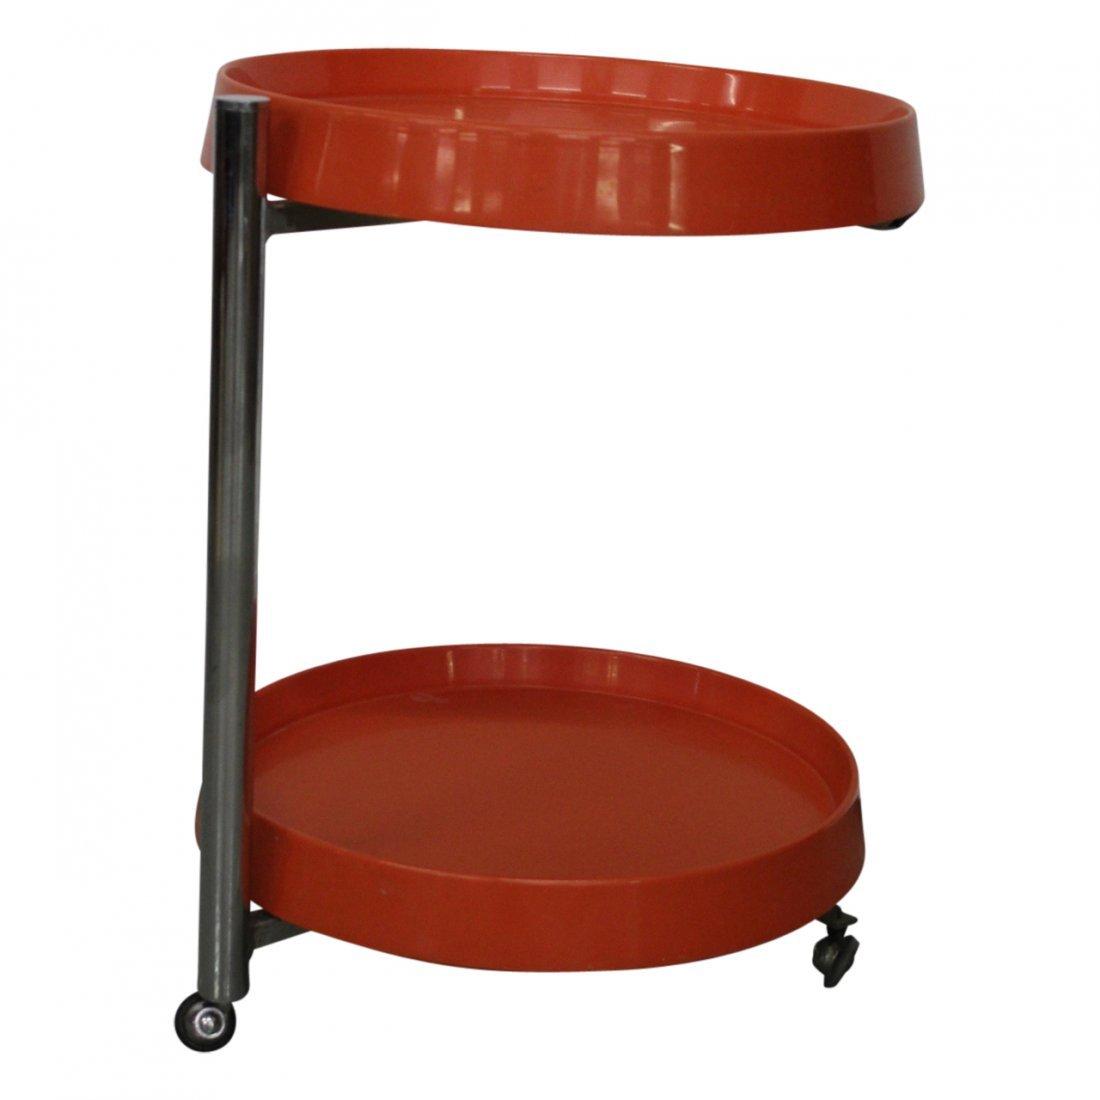 Italian Modern Orange and Chrome End Table